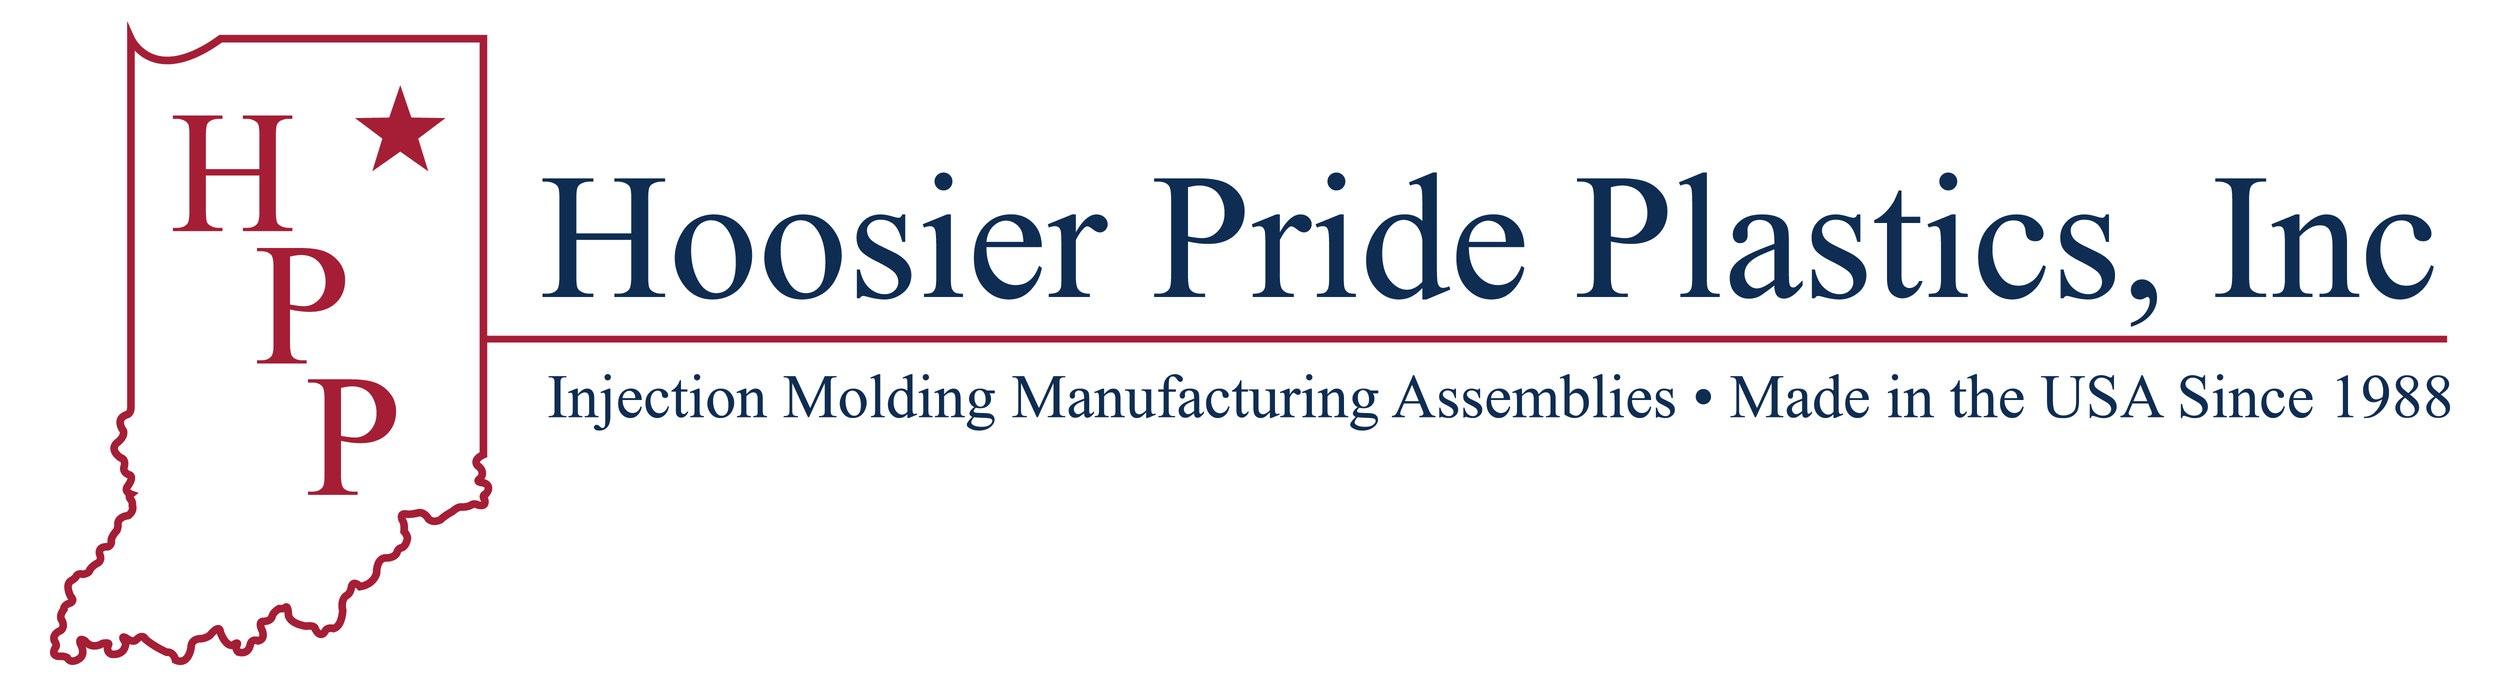 Hoosier Pride Plastics & Companies